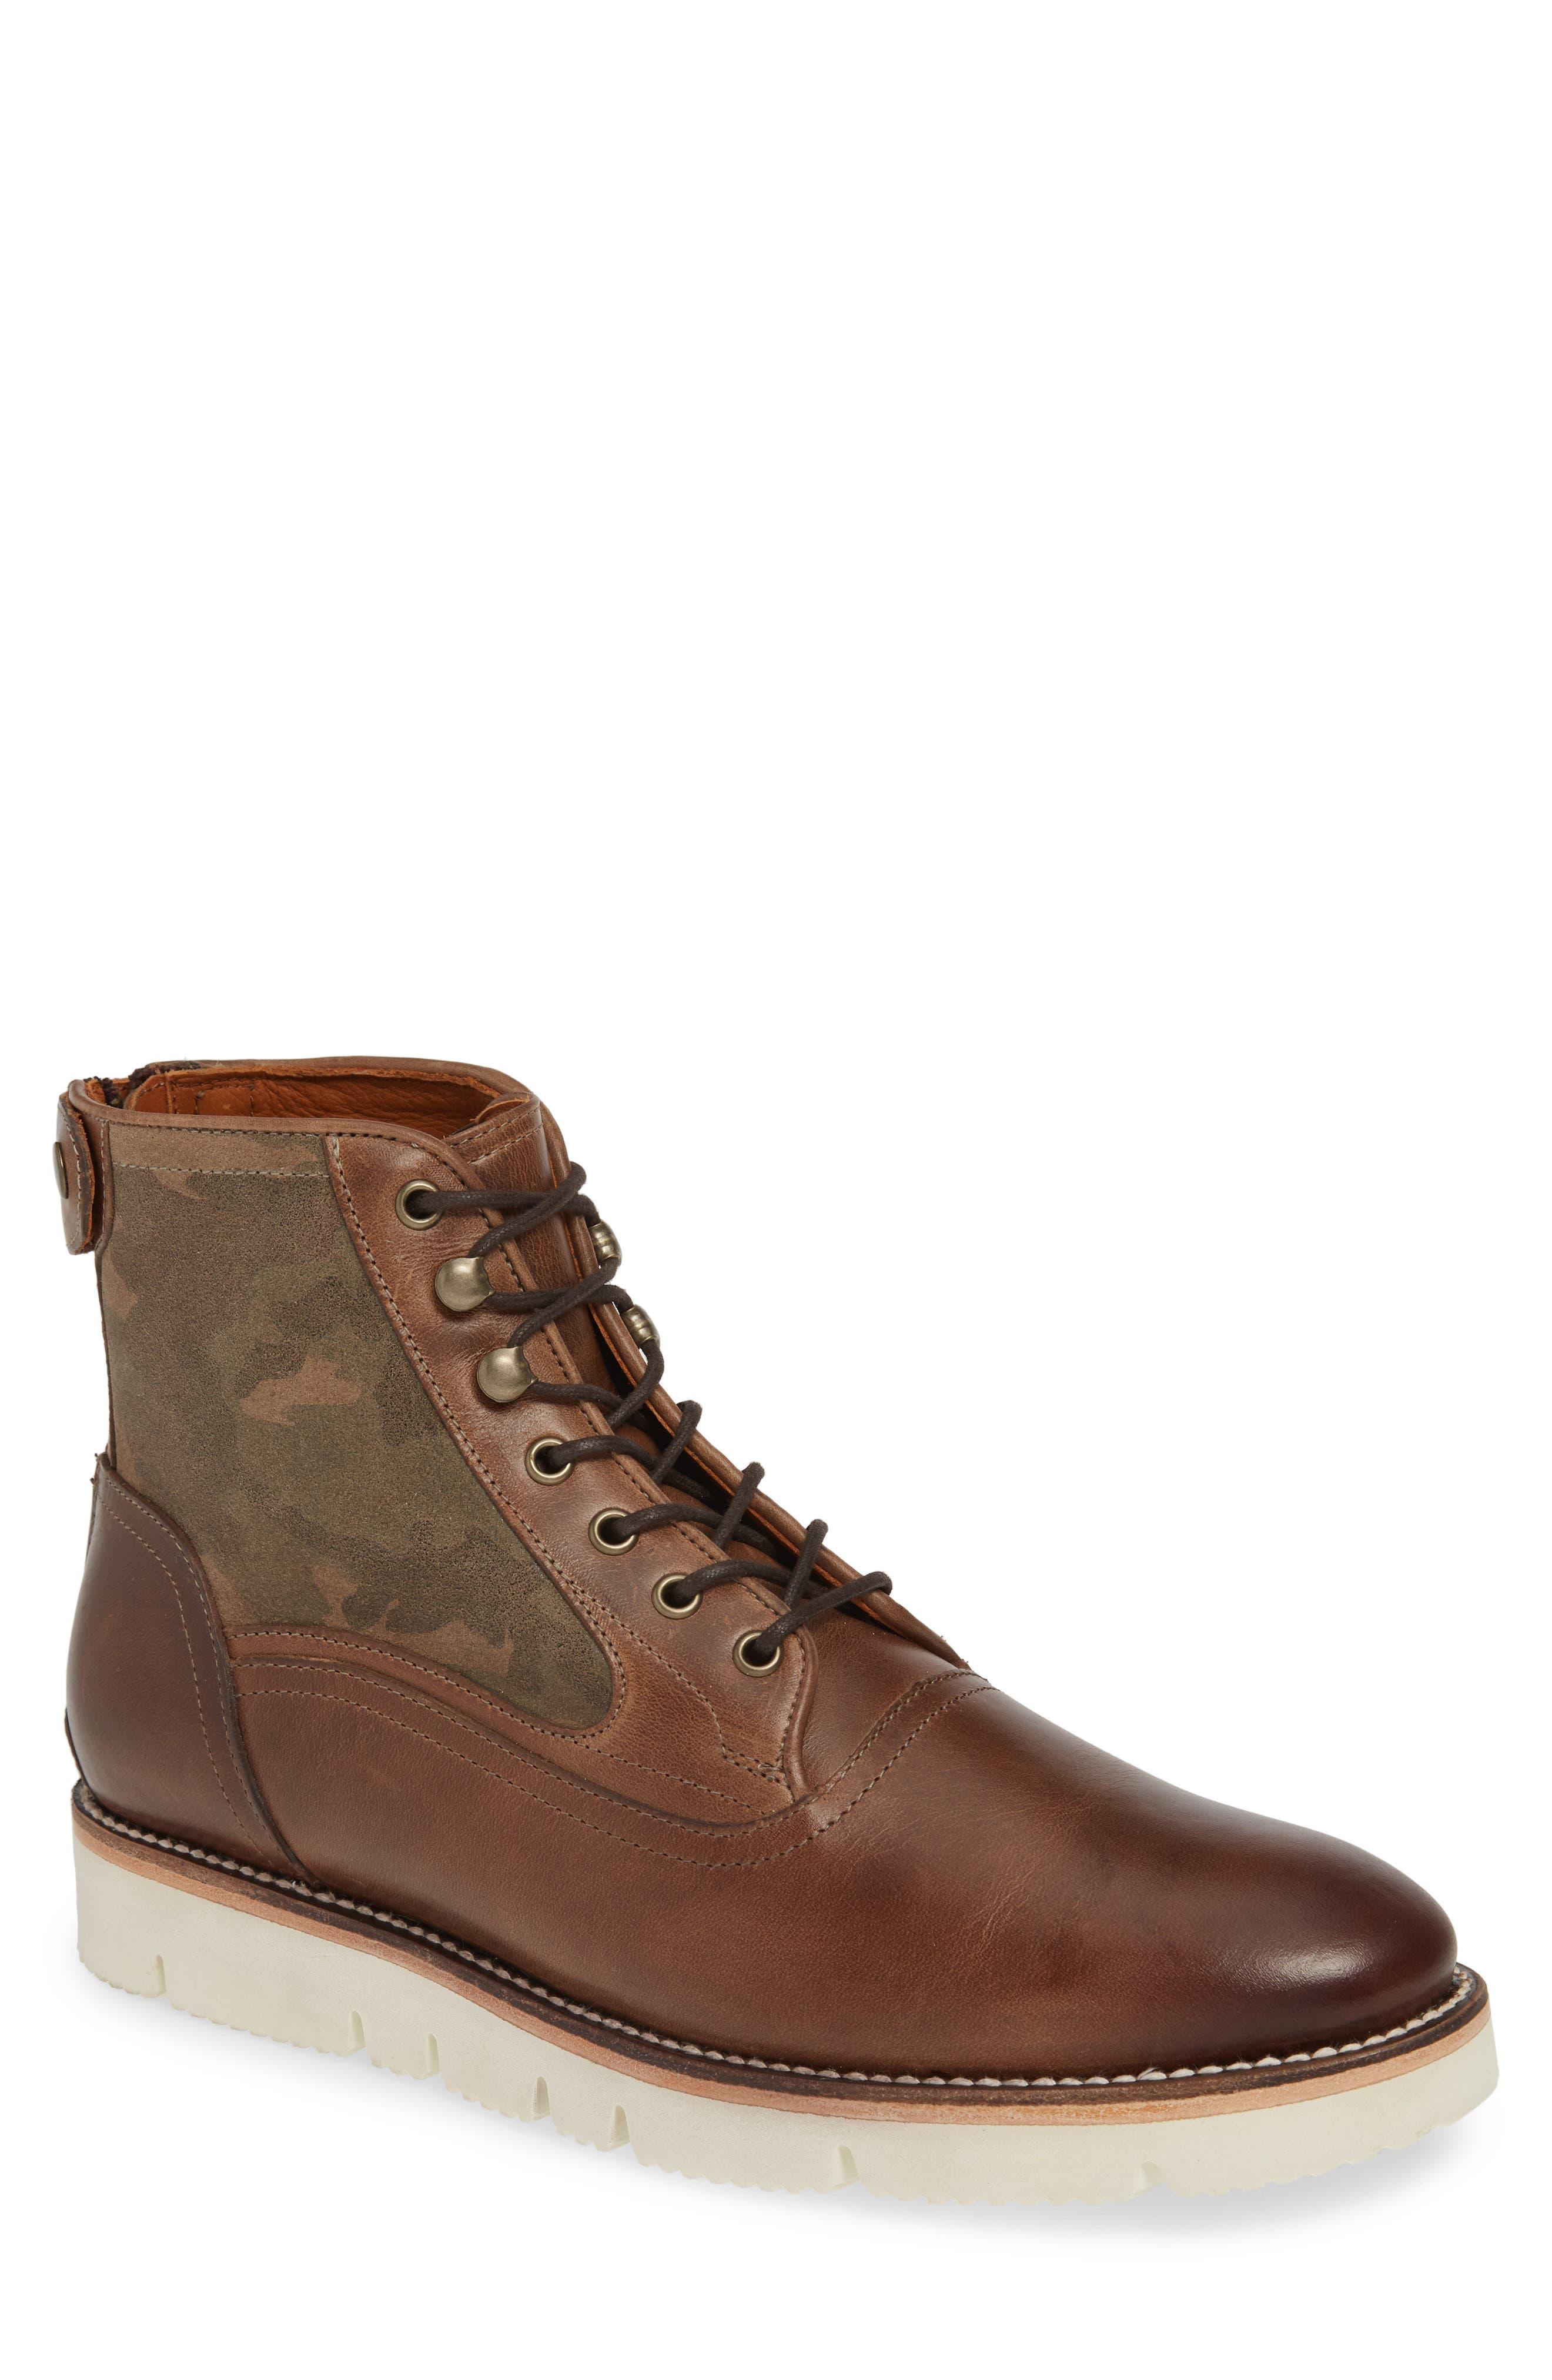 Ariat Fairview Plain Toe Boot- Brown